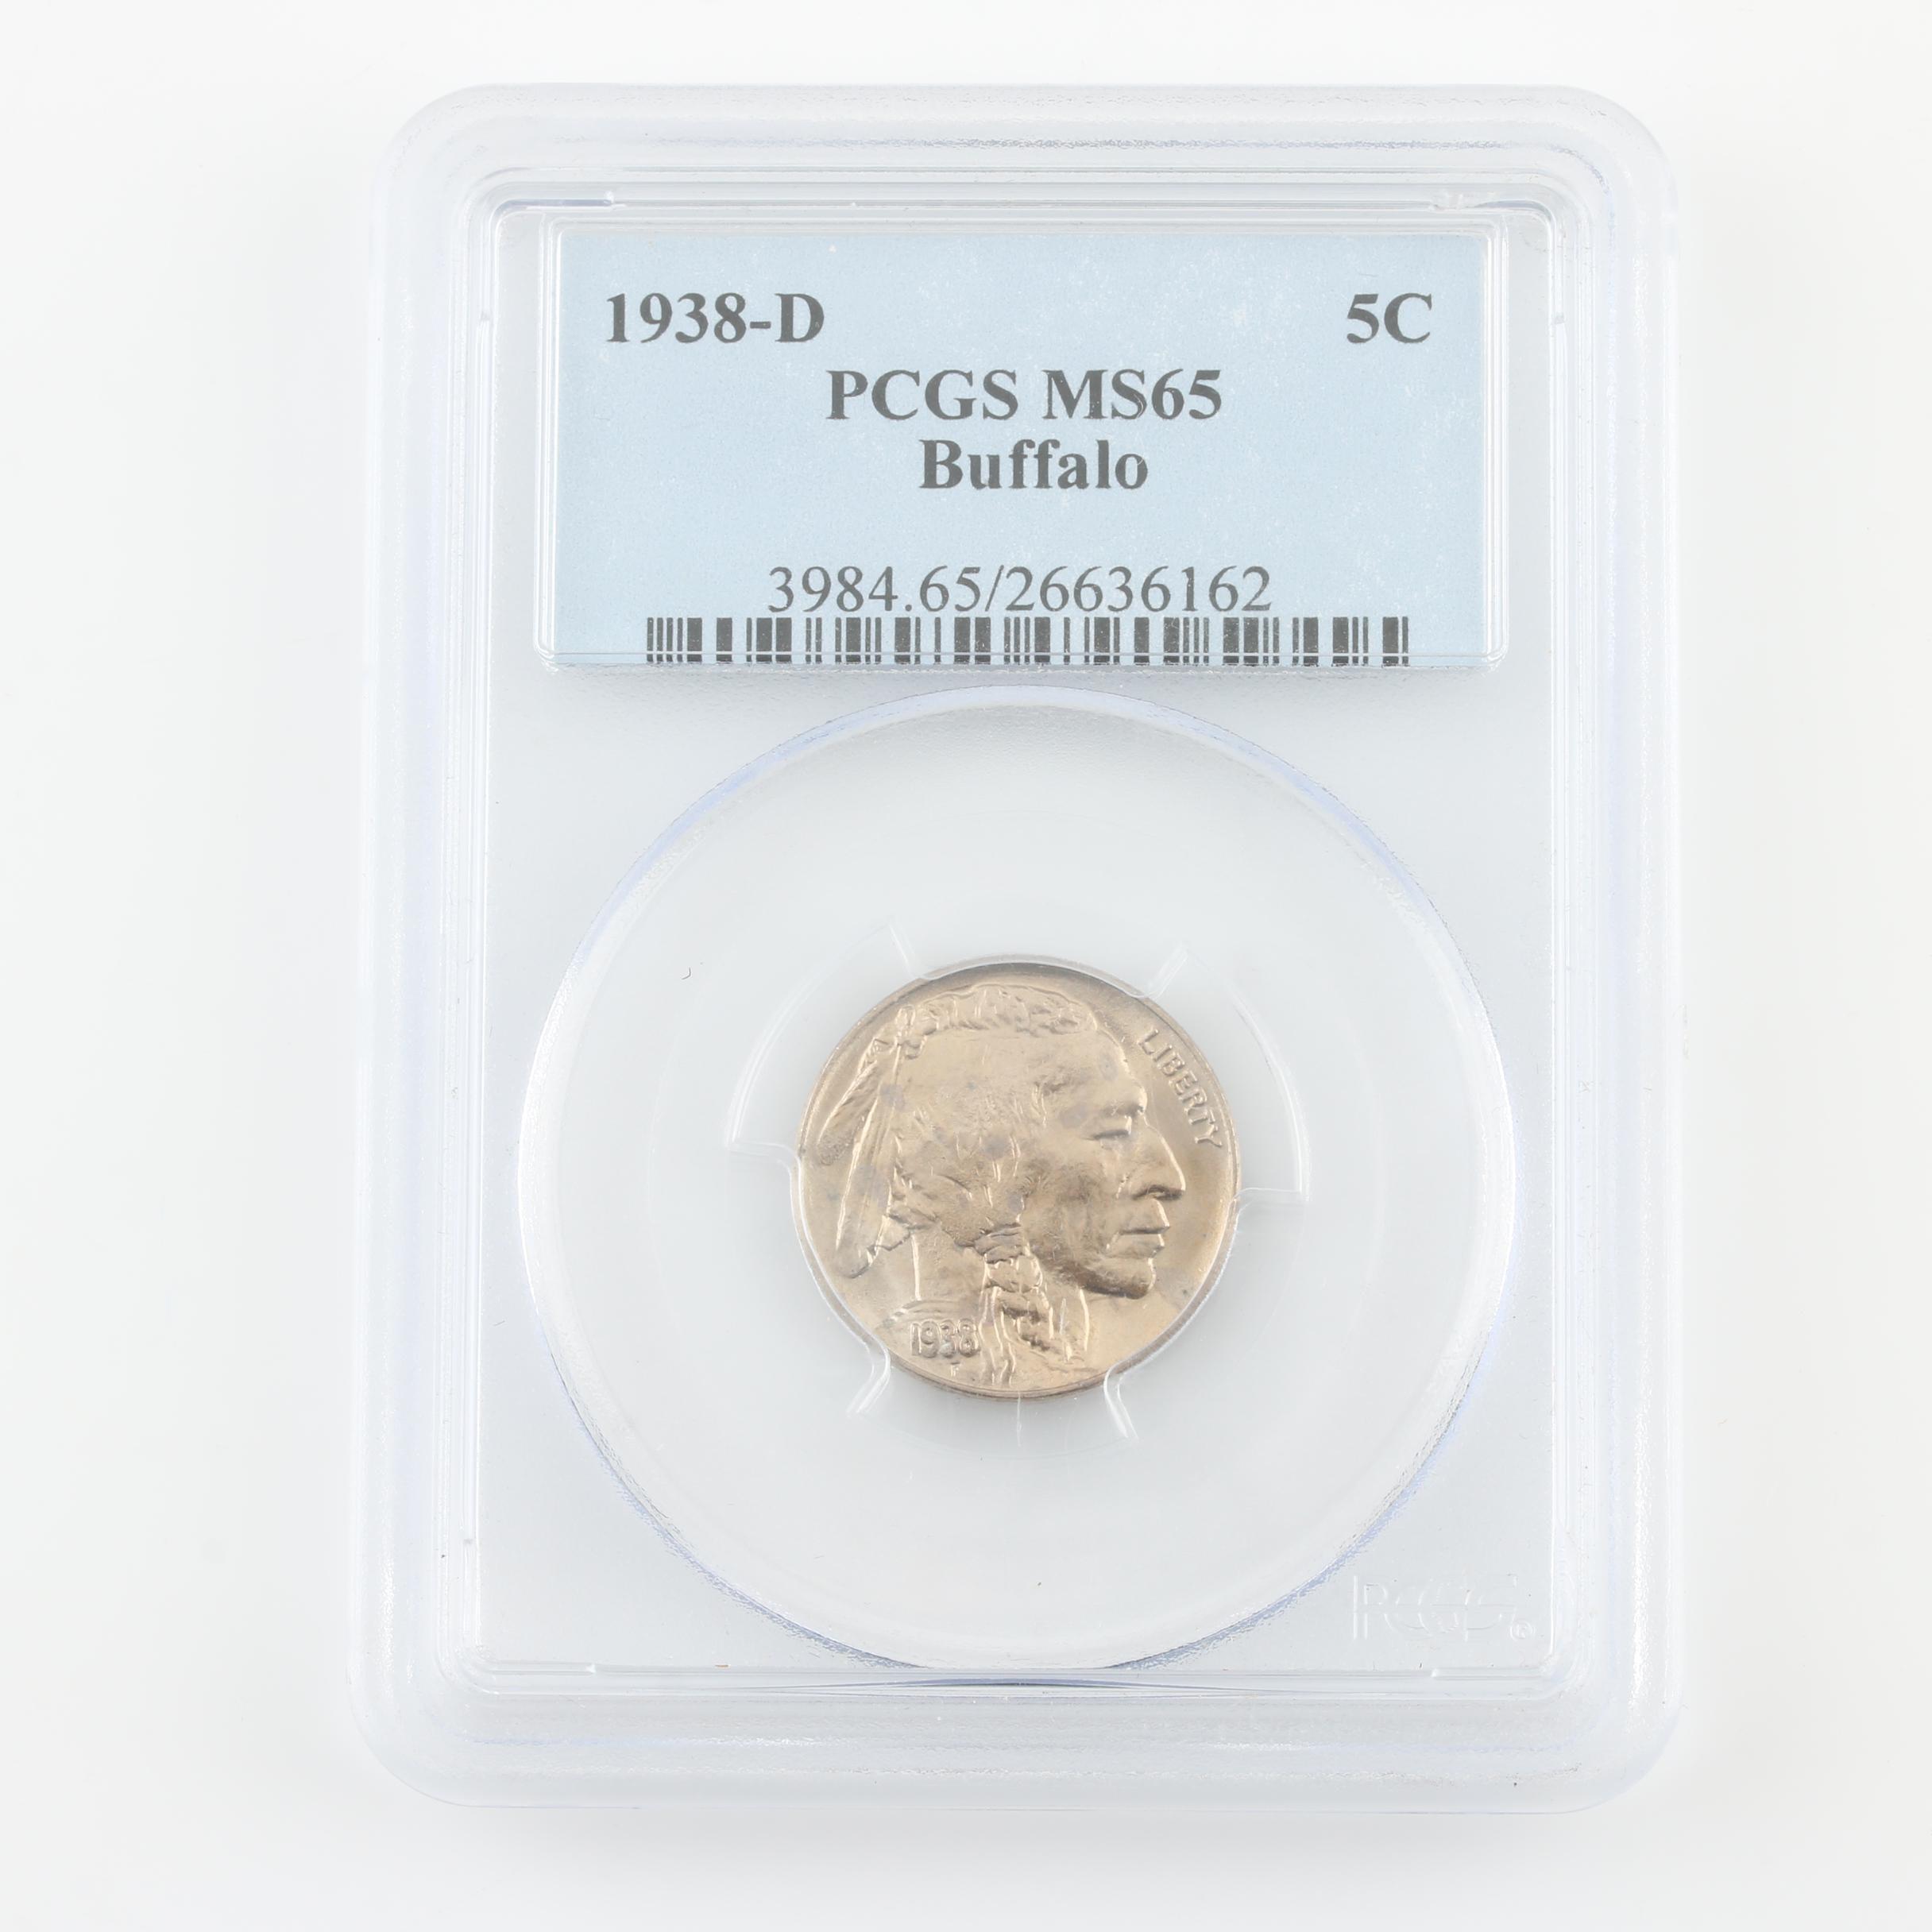 PCGS Graded MS65 1938-D Buffalo Nickel